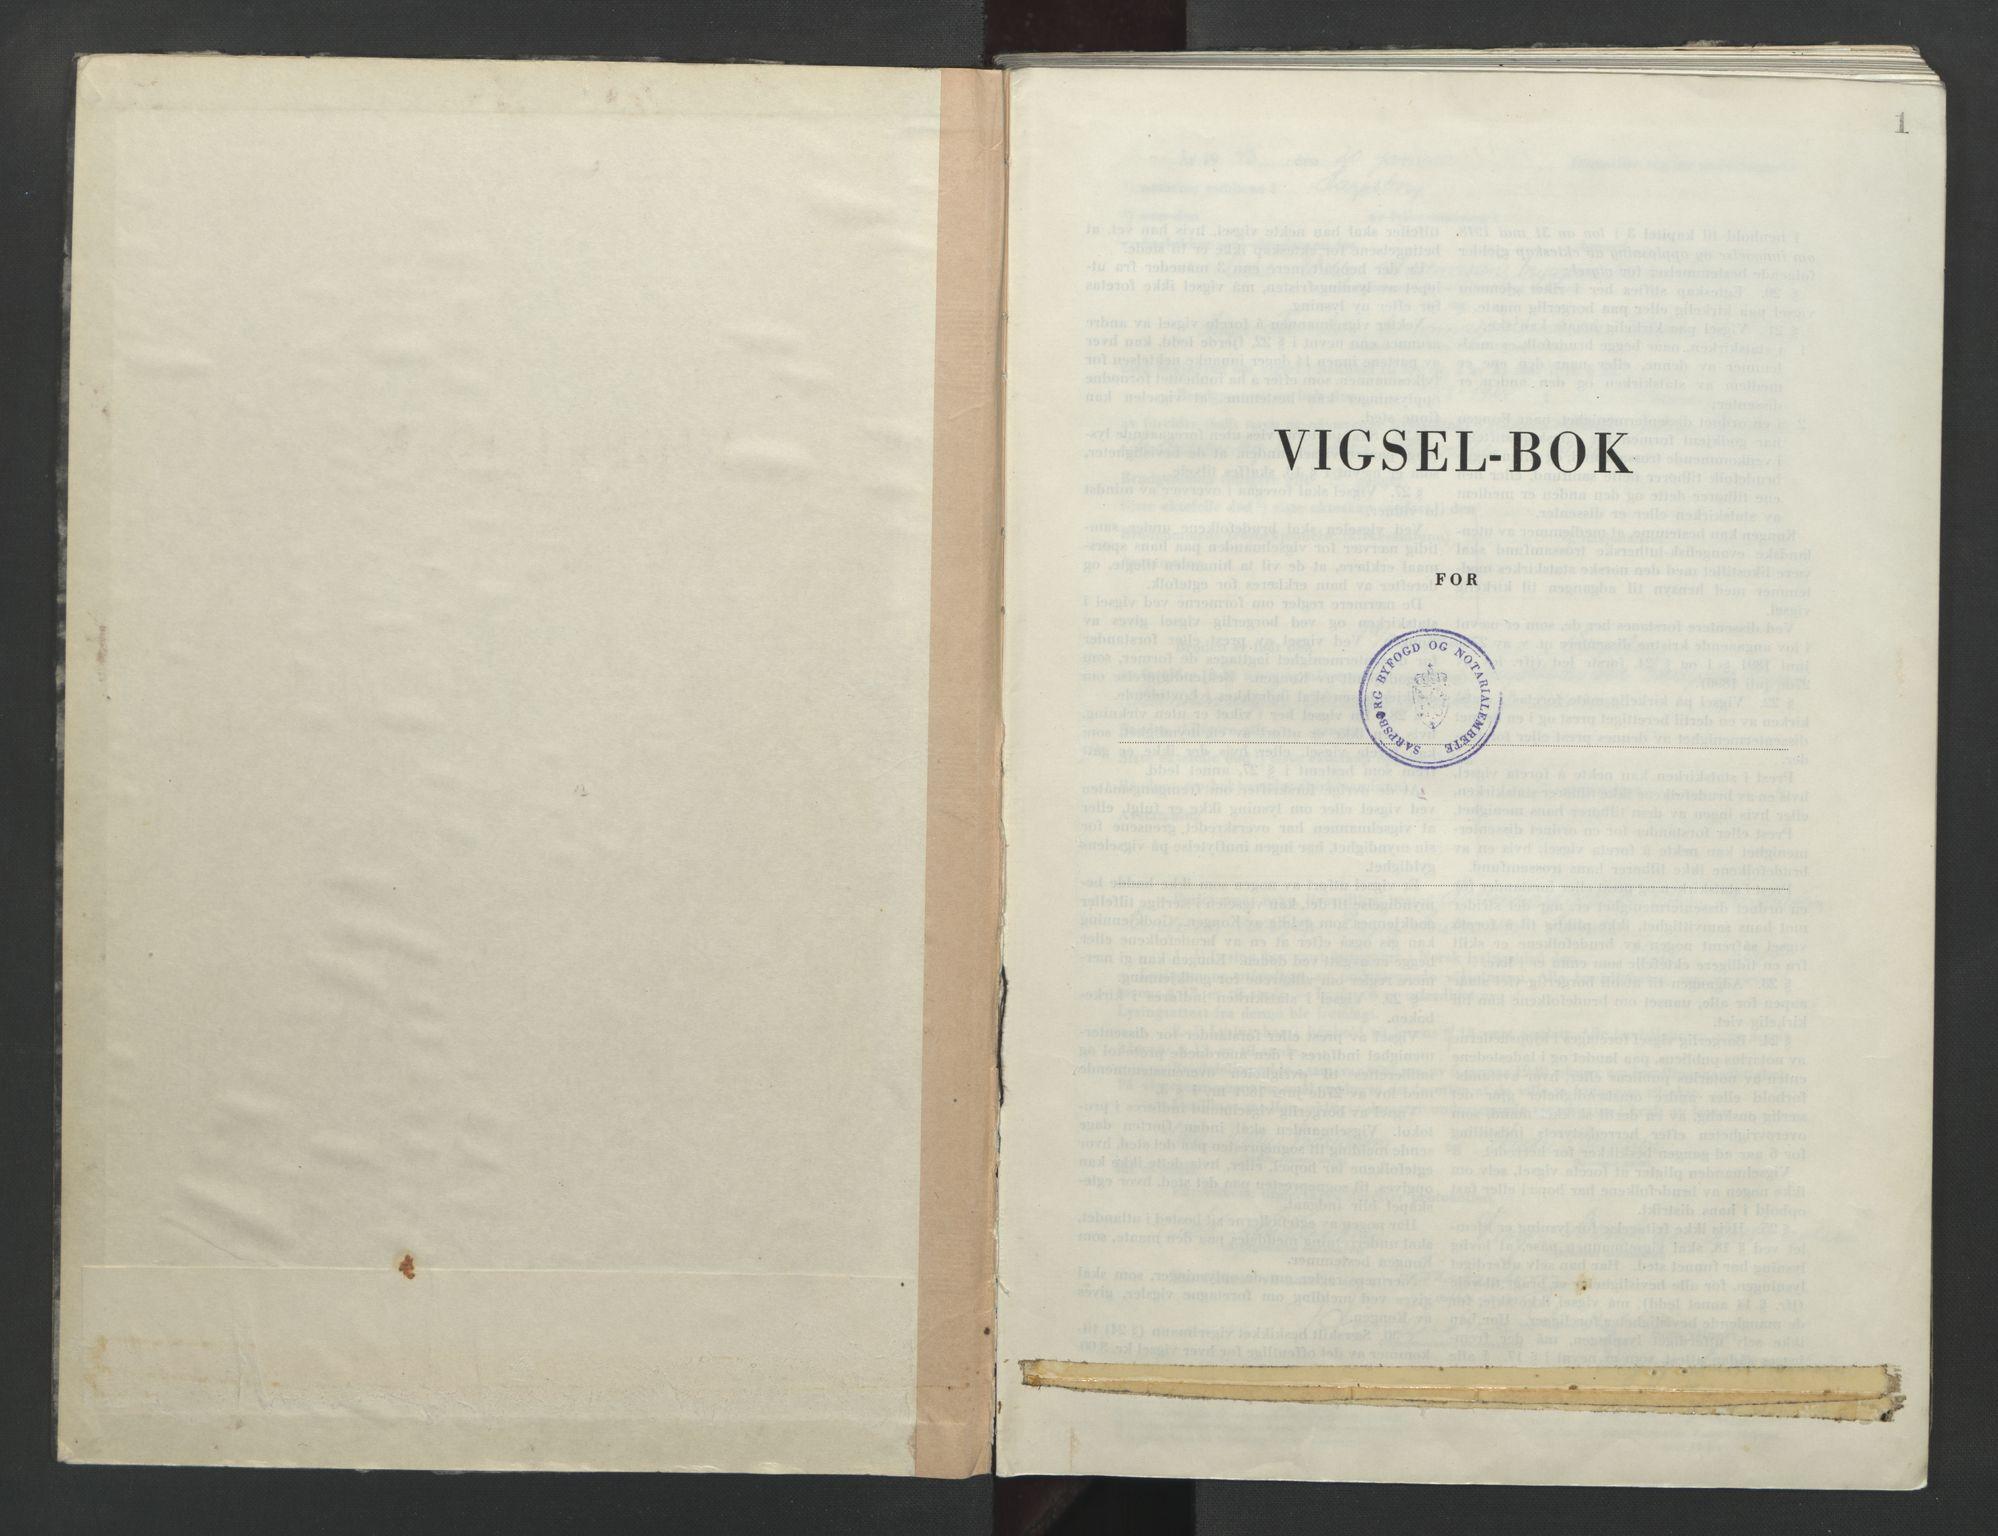 SAO, Sarpsborg byfogd, L/Lb/Lba/L0004: Vigselbok, 1945-1952, s. 1